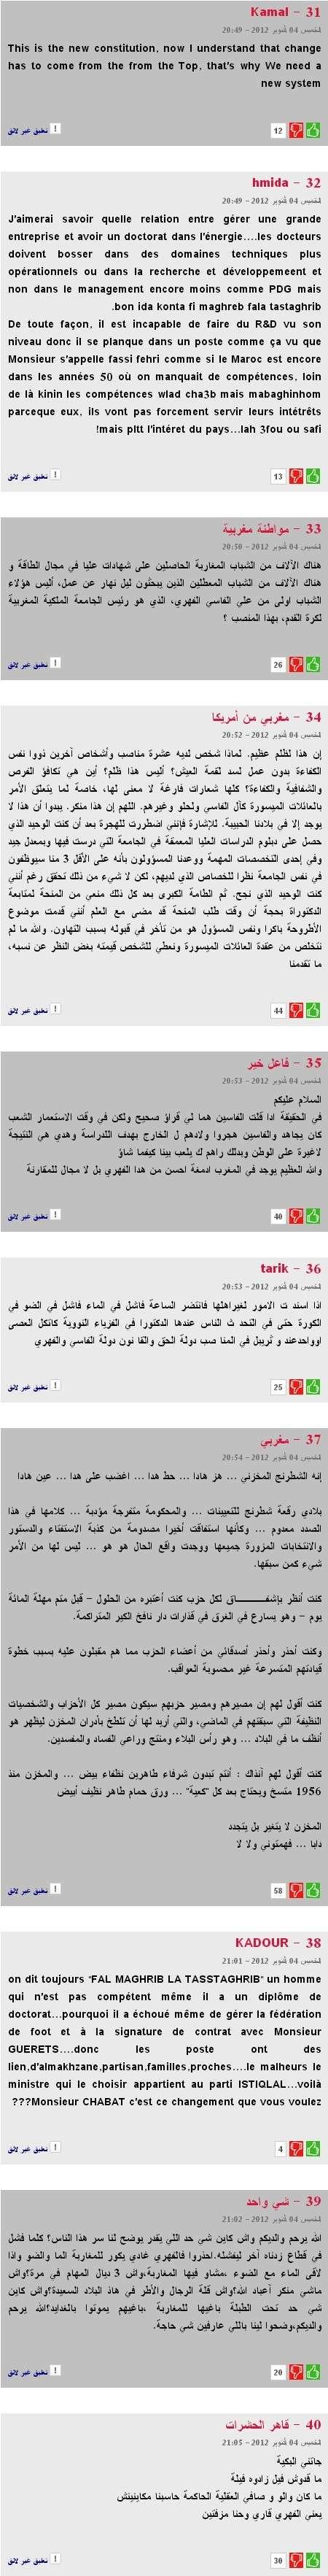 Réactions des marocains envers la nomination de ALi Fassi Ali410